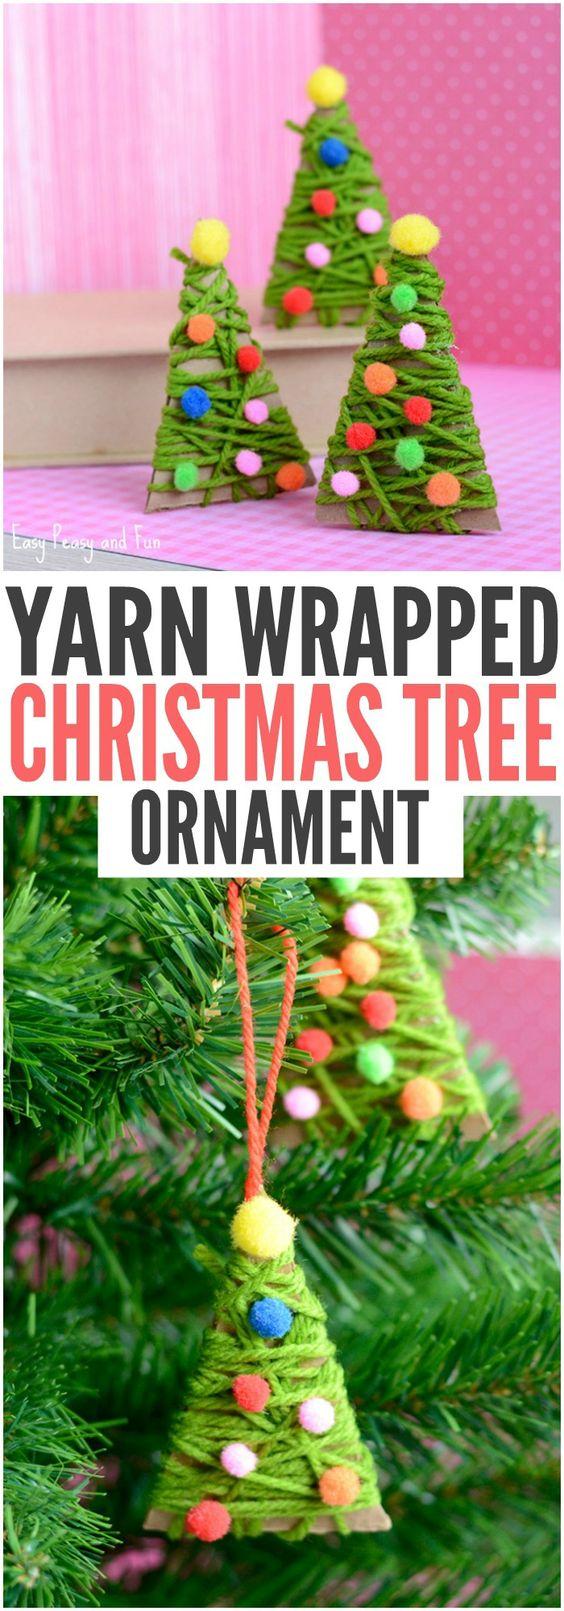 Yarn Wrapped Christmas Tree Ornaments Christmas trees